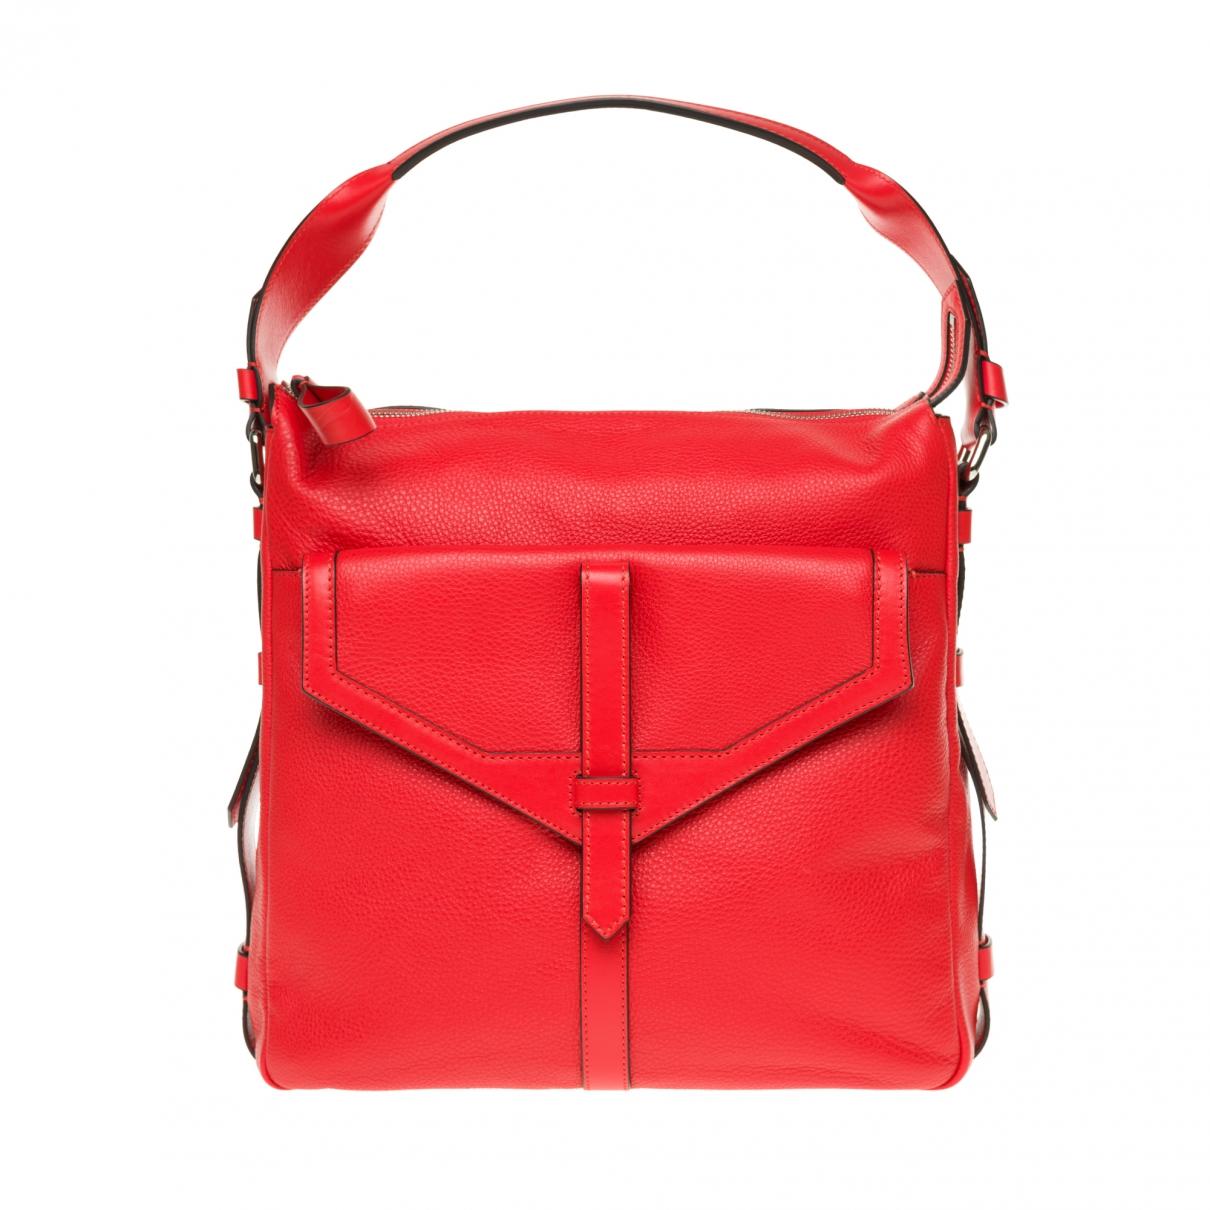 Lancel \N Red Leather handbag for Women \N